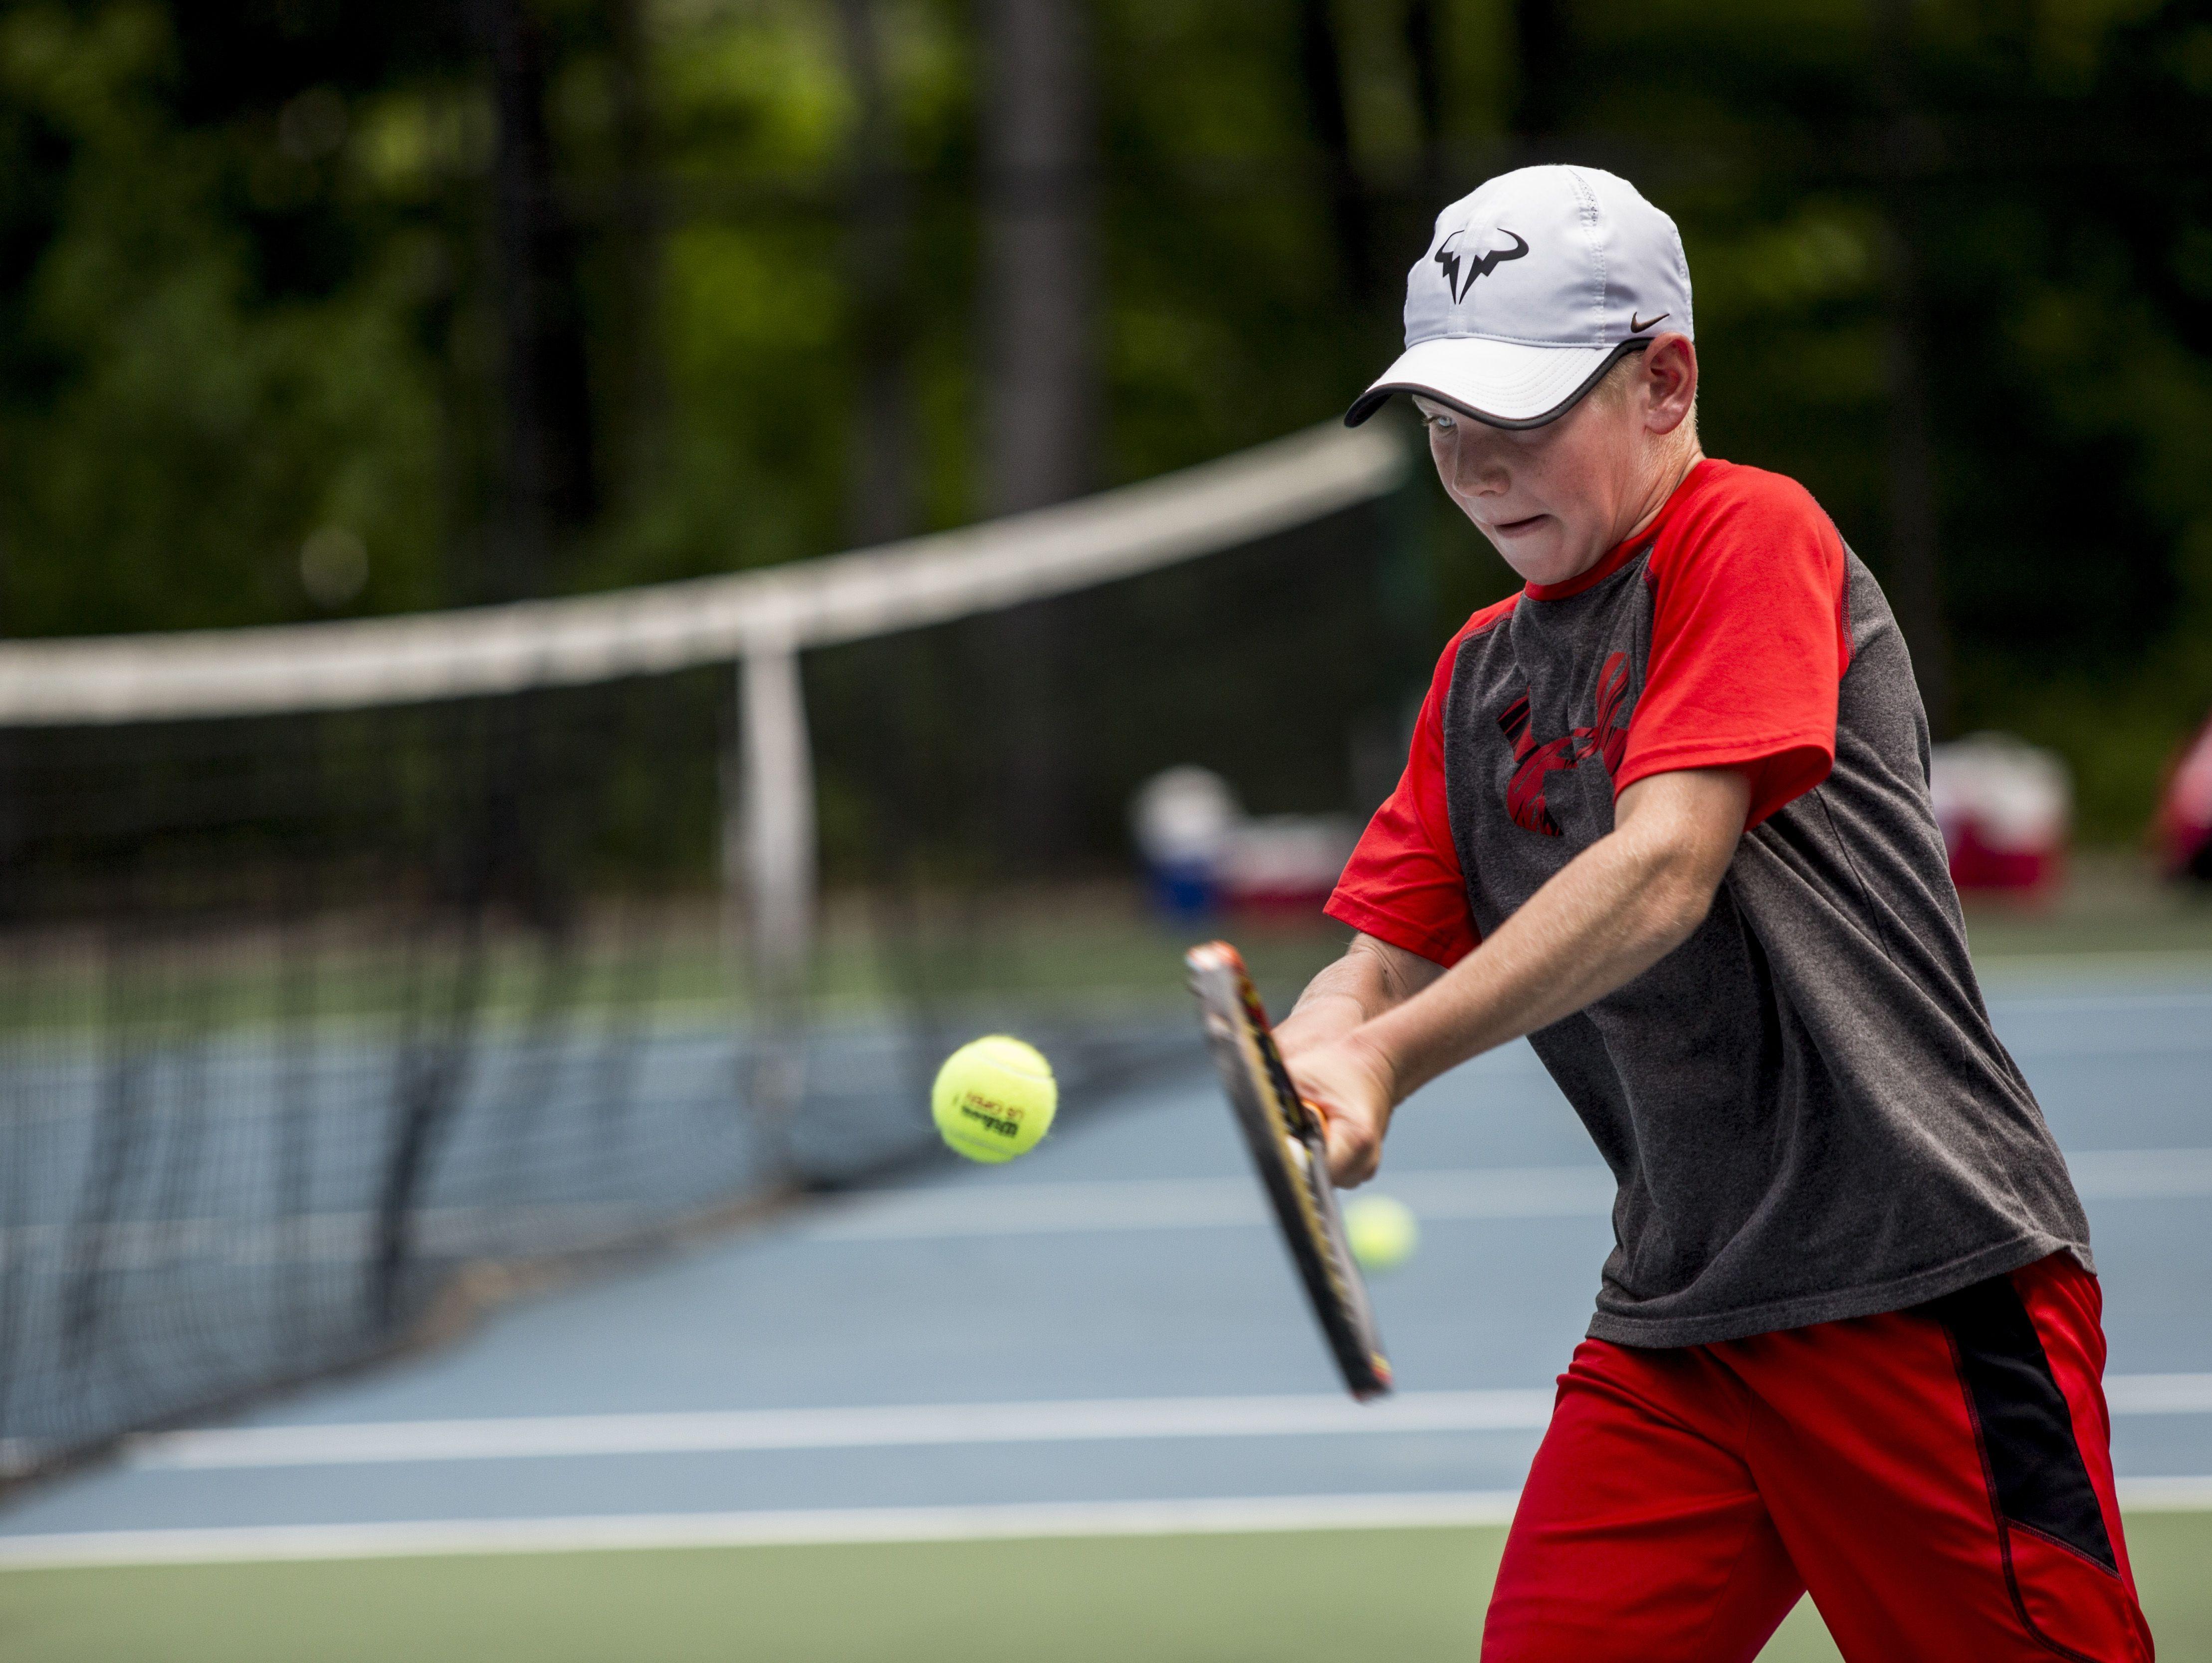 Derek Distelrath, 12, of St. Clair, returns the ball during the Francis J. Robinson Memorial International Tennis Tournament Friday, August 5, 2016 at Sanborn Park in Port Huron.